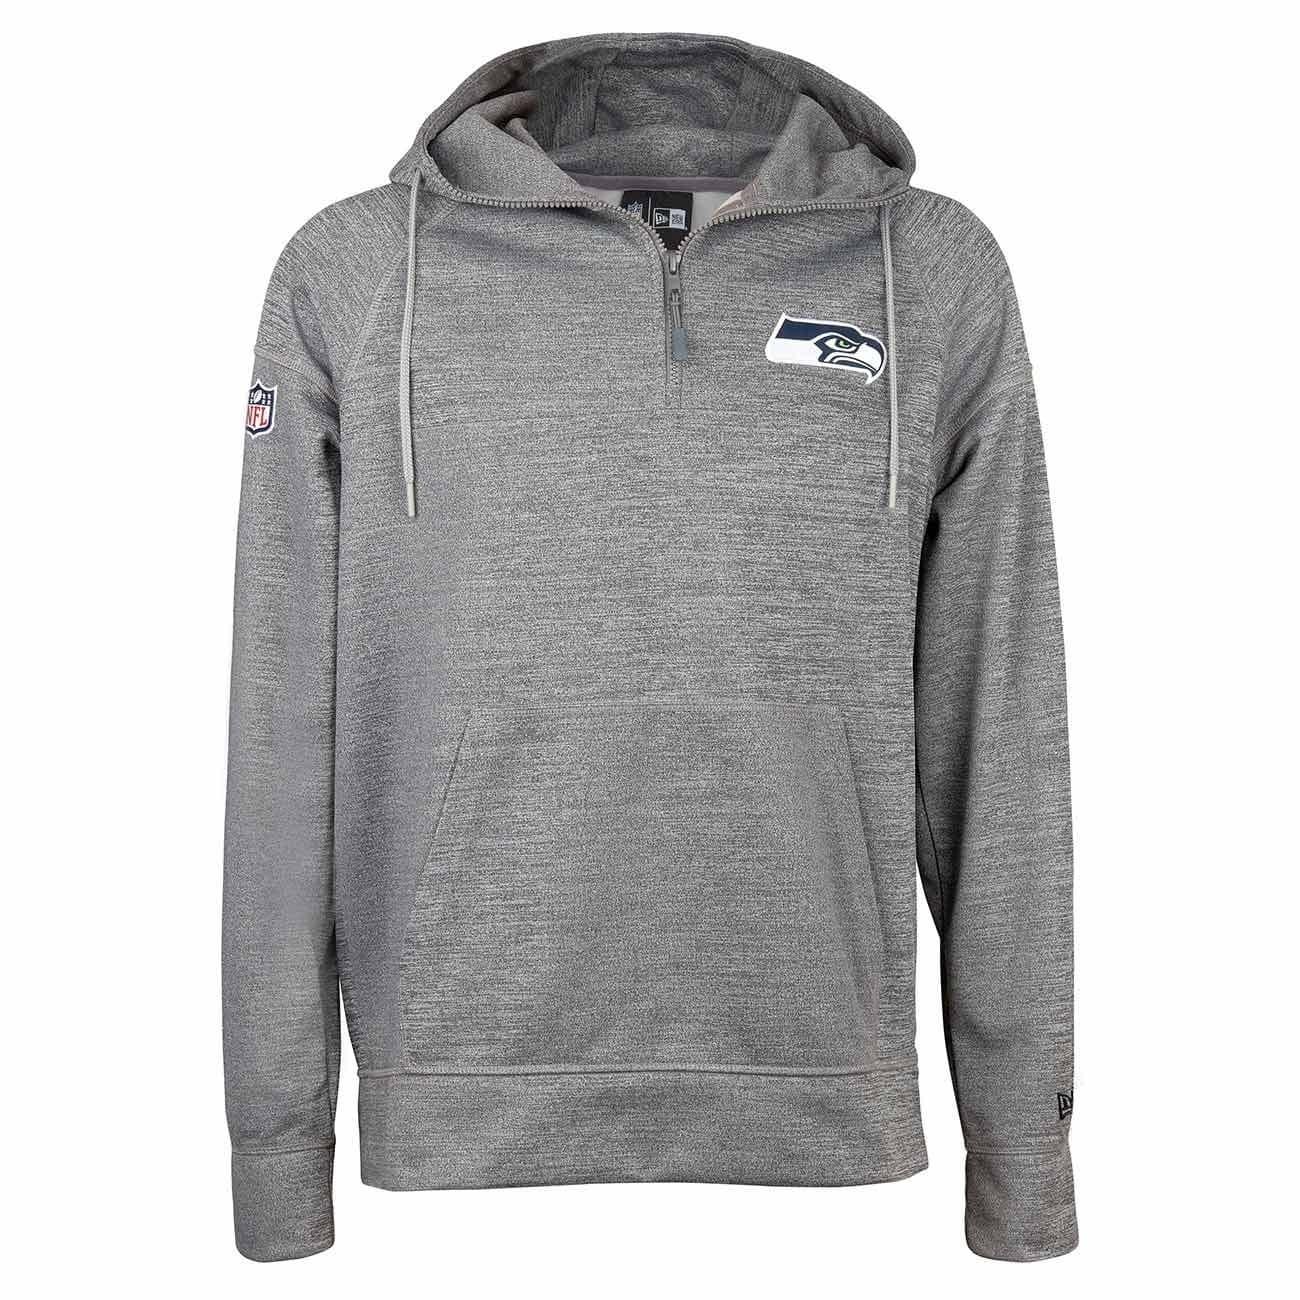 ecfc15aa6 New Era Seattle Seahawks Quarter-Zip Jersey NFL Hoodie Sweatshirt Grey